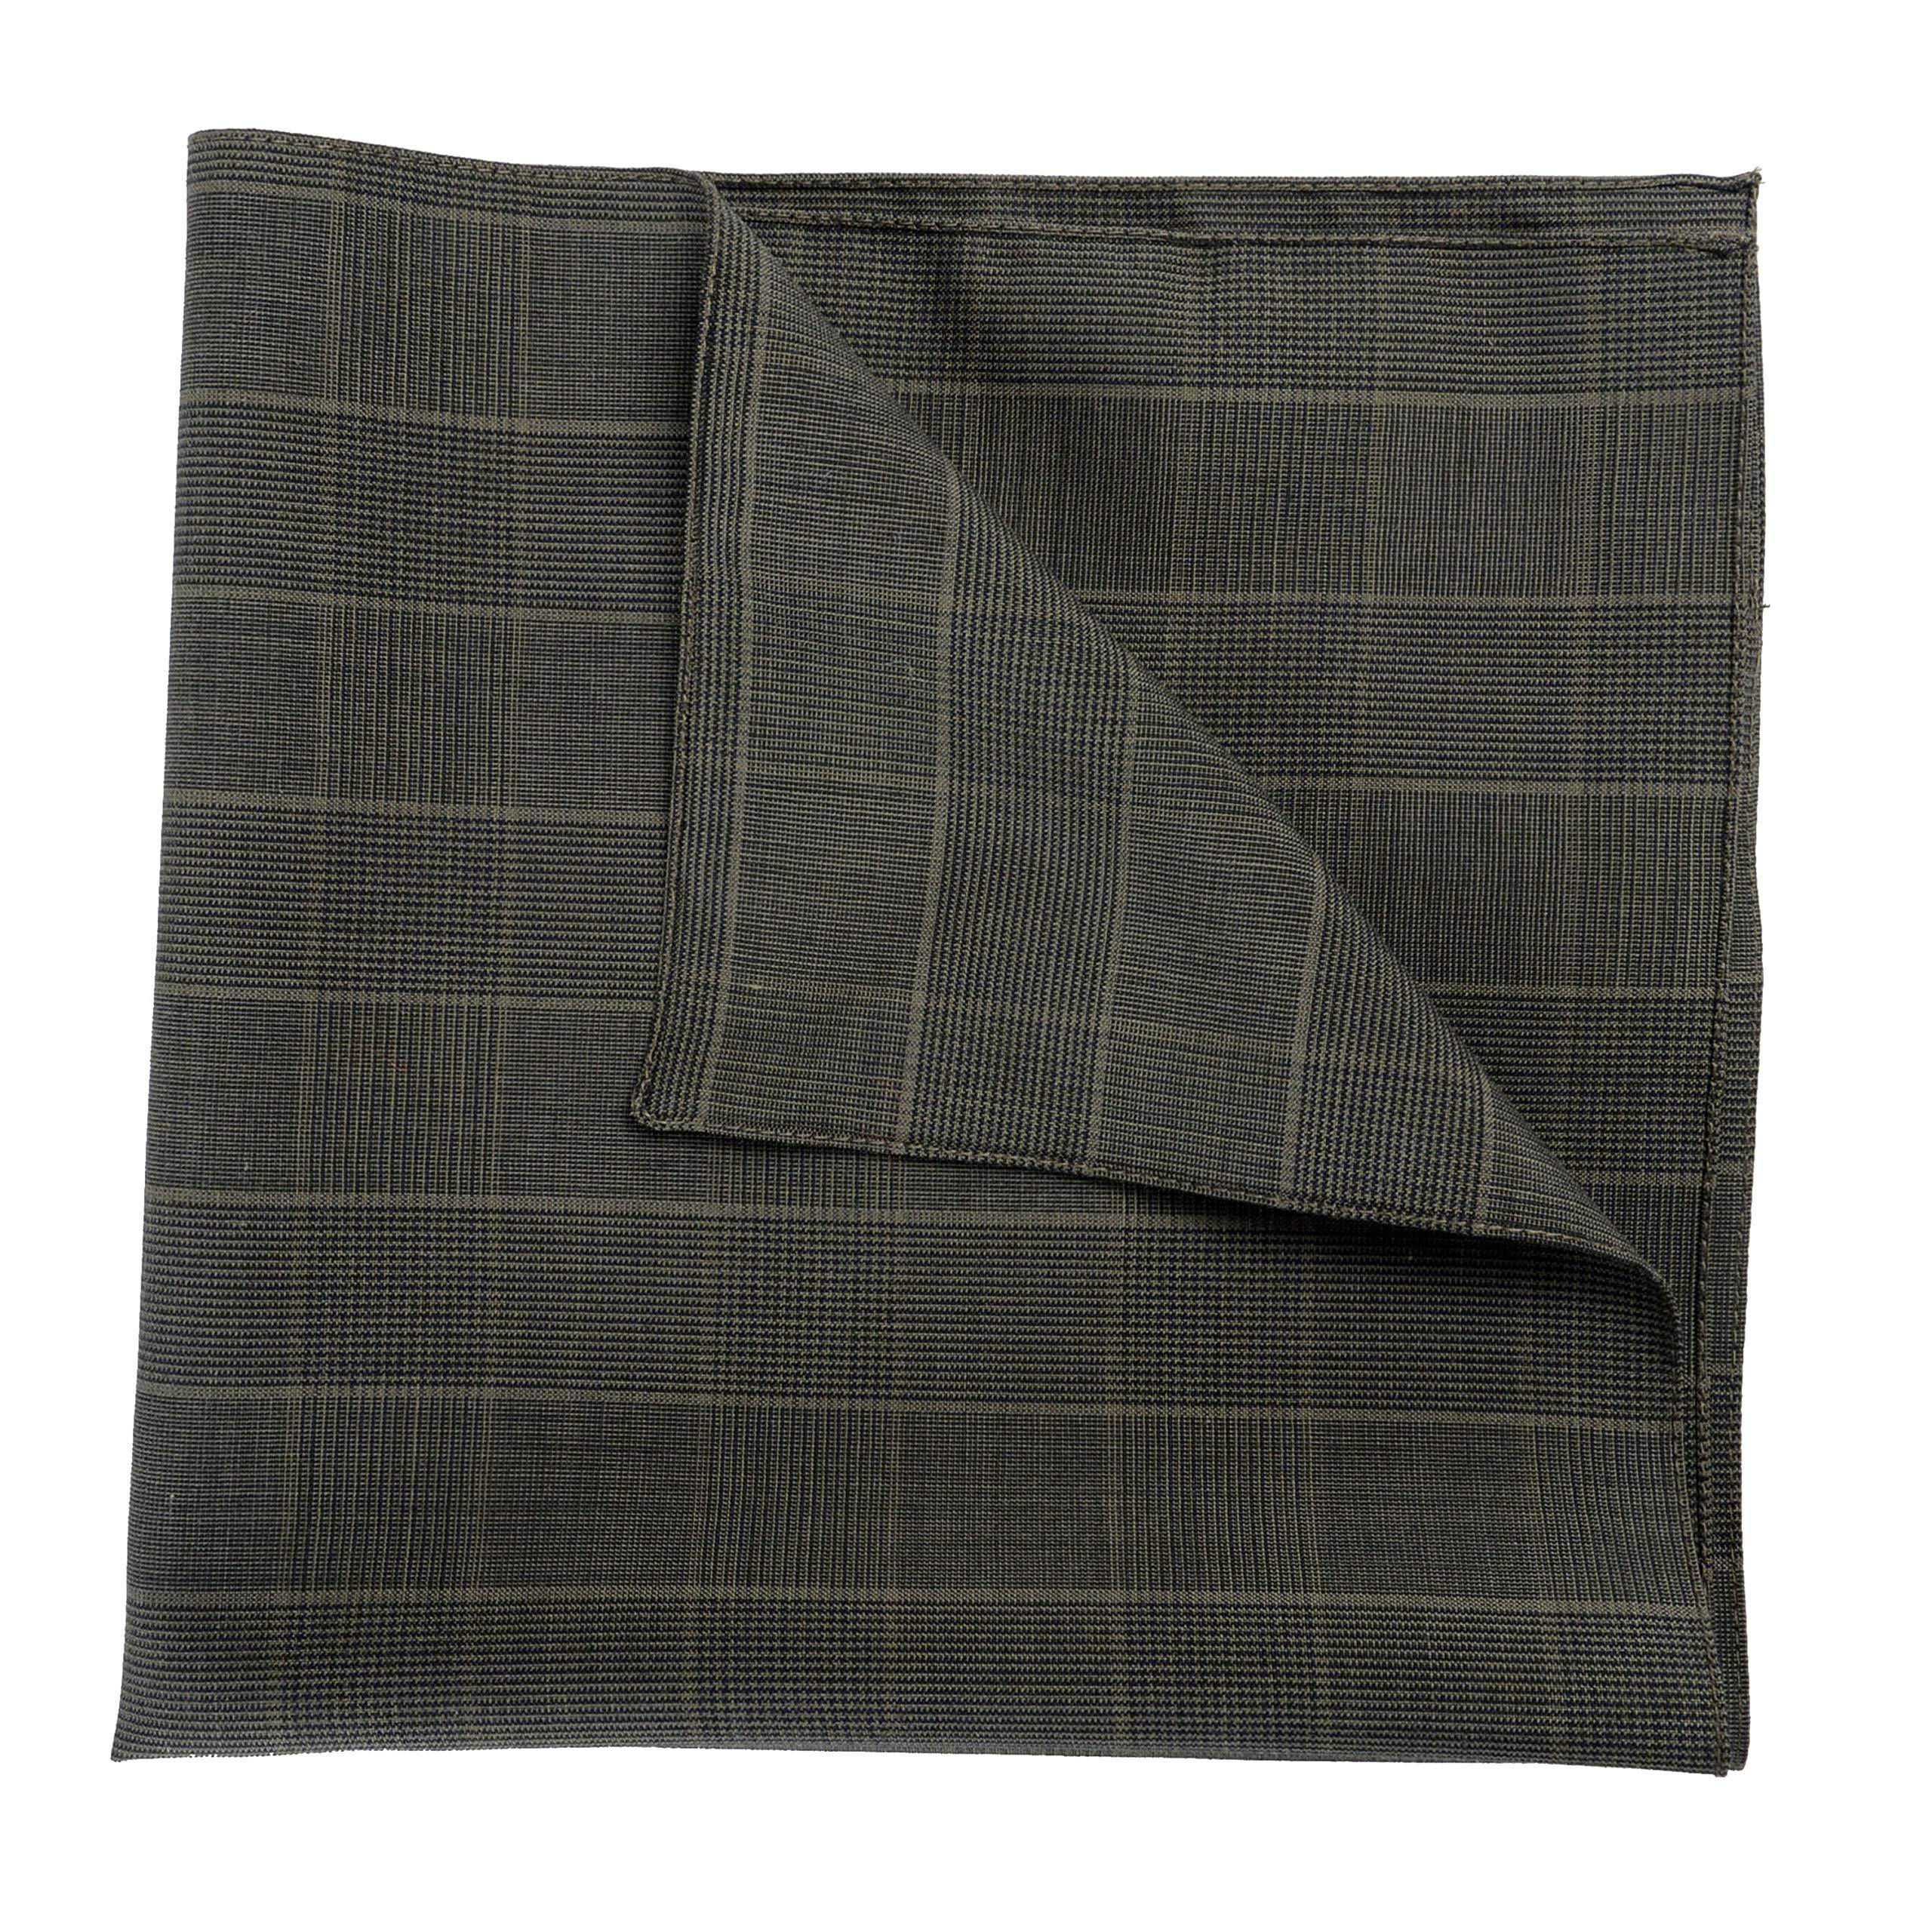 Versace Men's Wool Mohair Silk Green Pocket Square